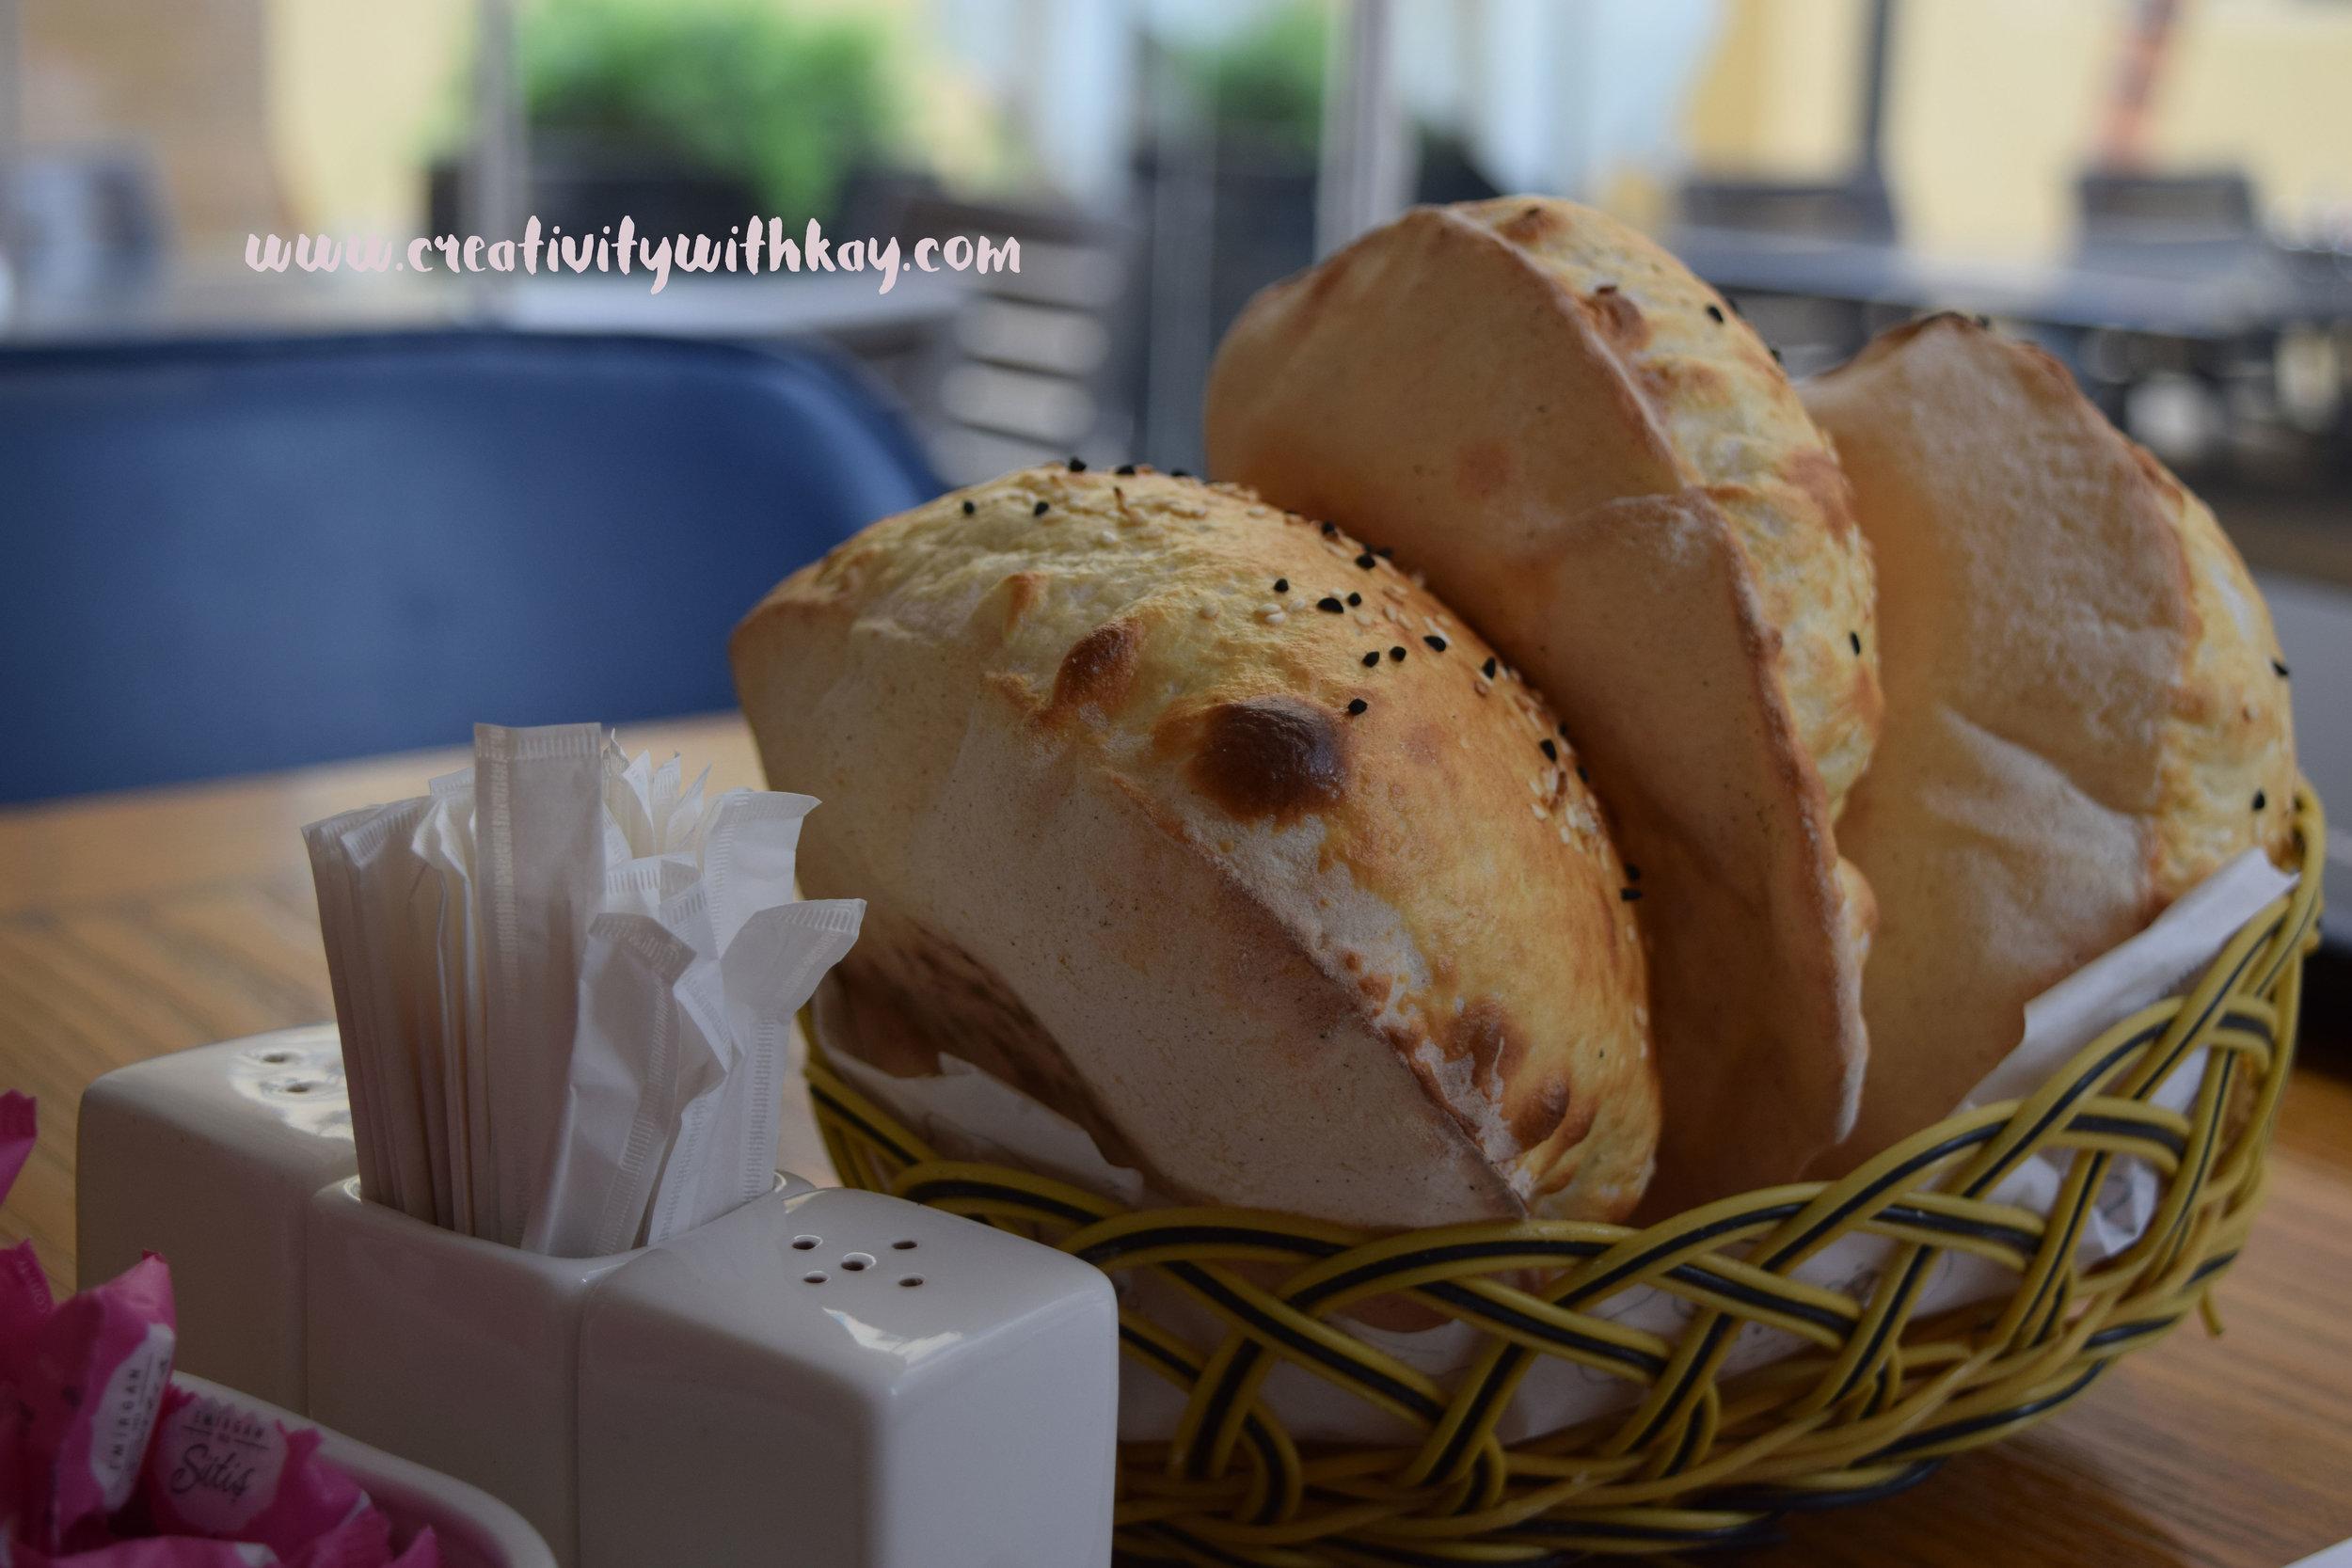 ramadan-2016-iftar-qatar-blogger-khansa-turkish-emirgansutis-bread.jpg